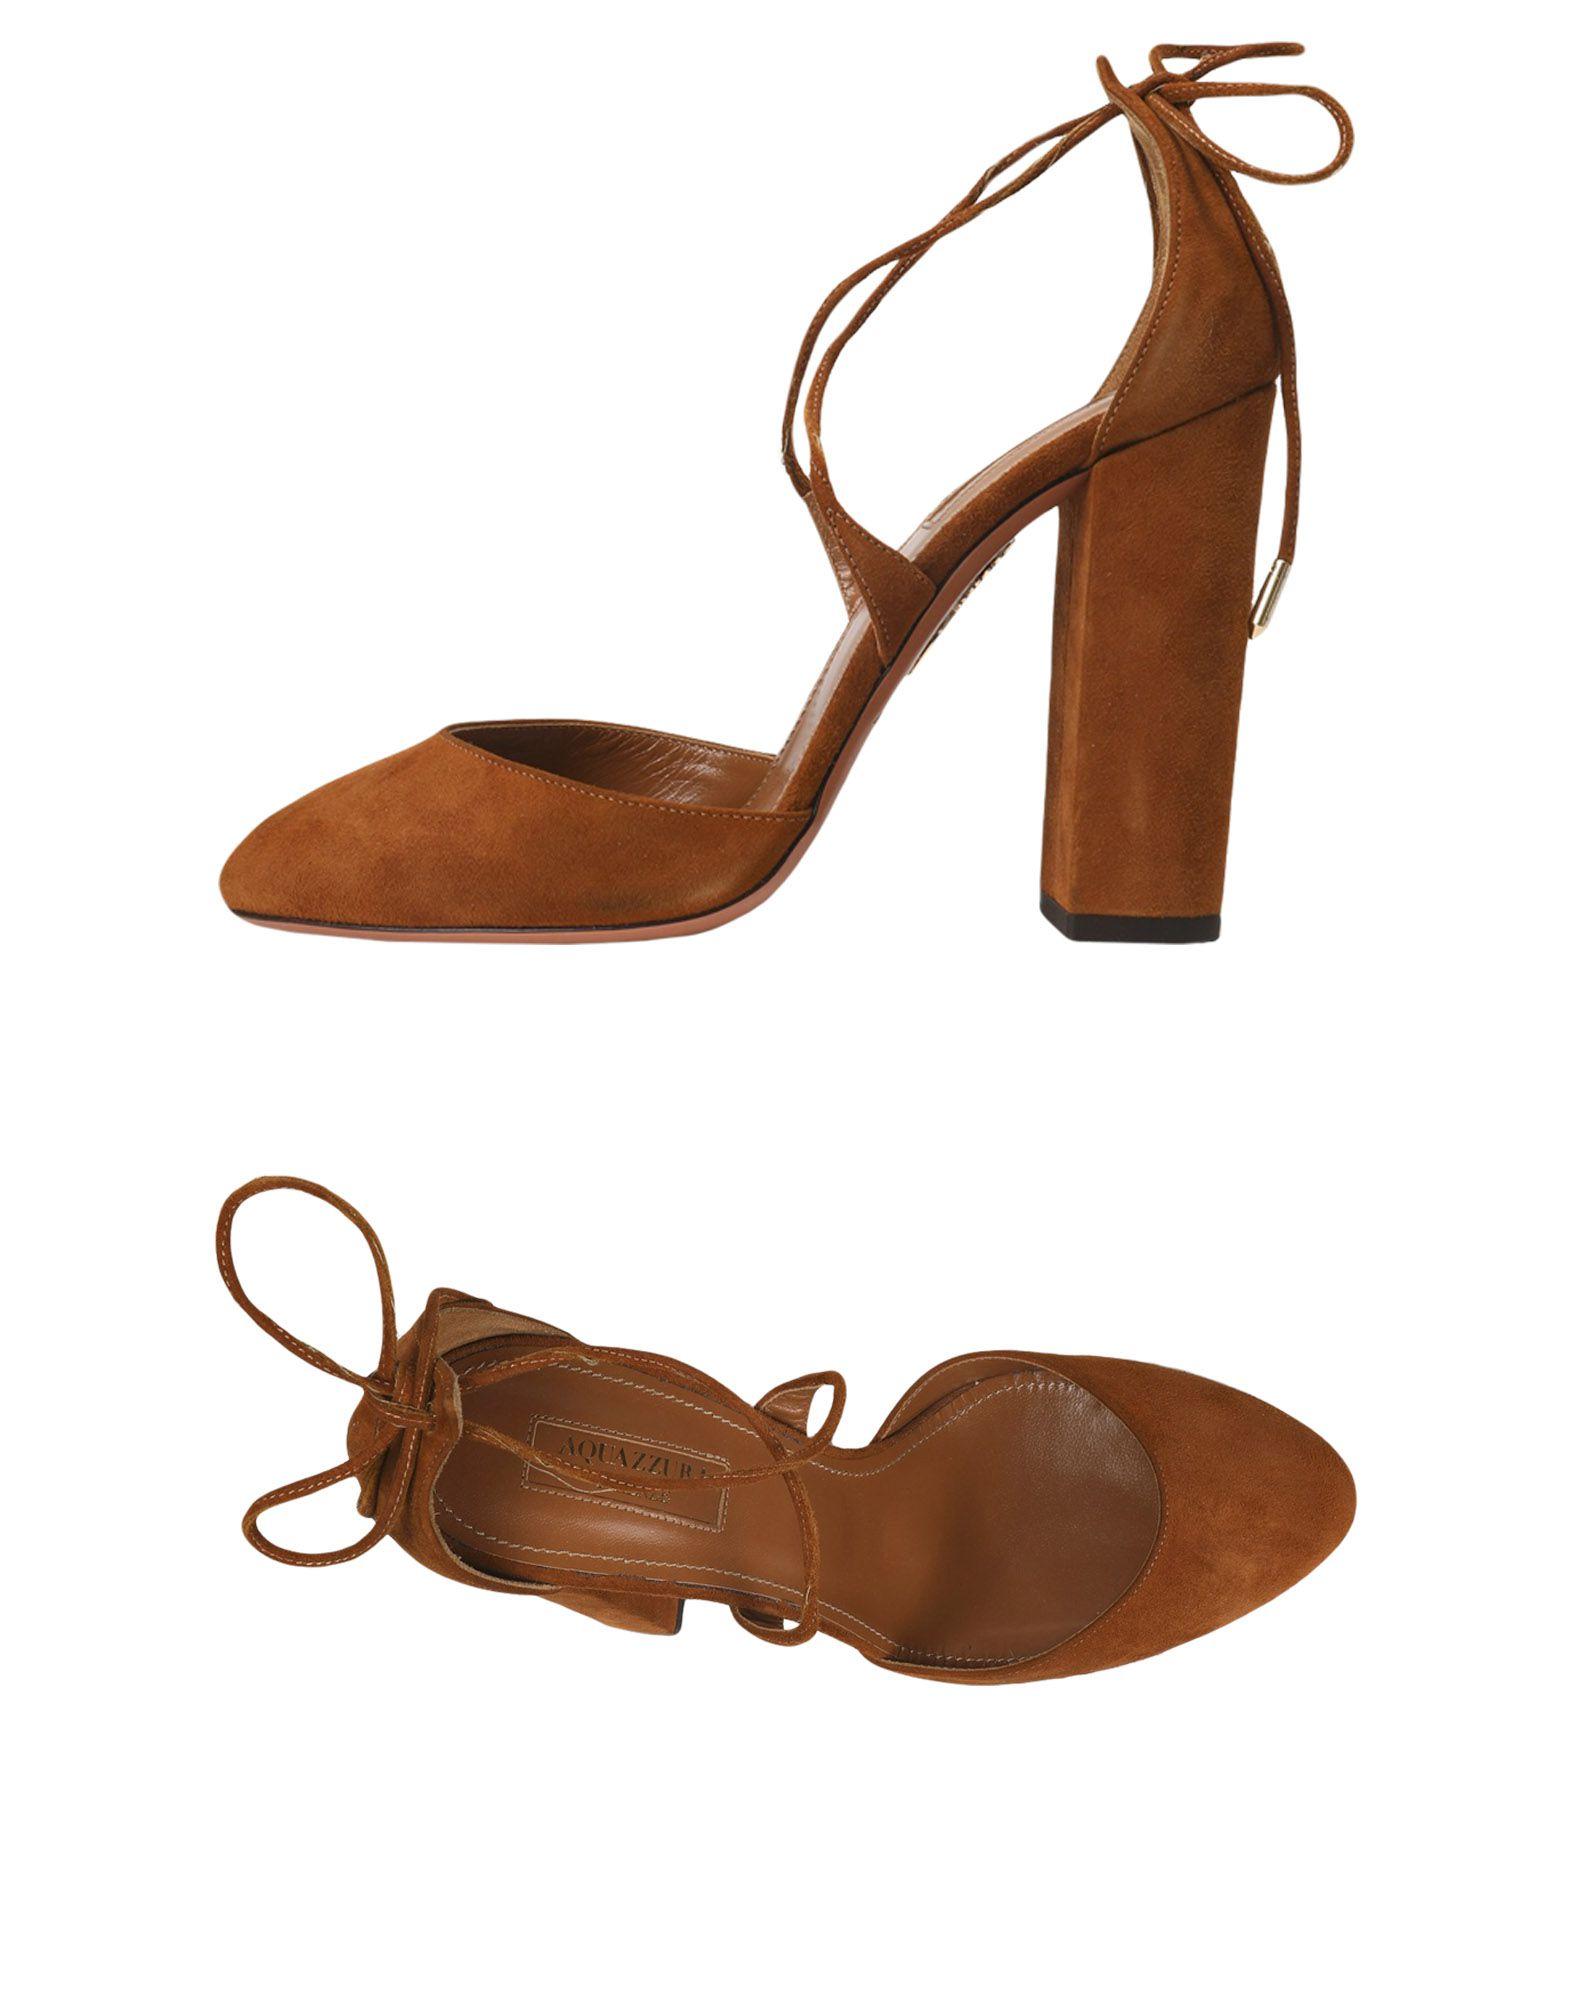 Escarpins Aquazzura Femme - Escarpins Aquazzura Marron Chaussures femme pas cher homme et femme